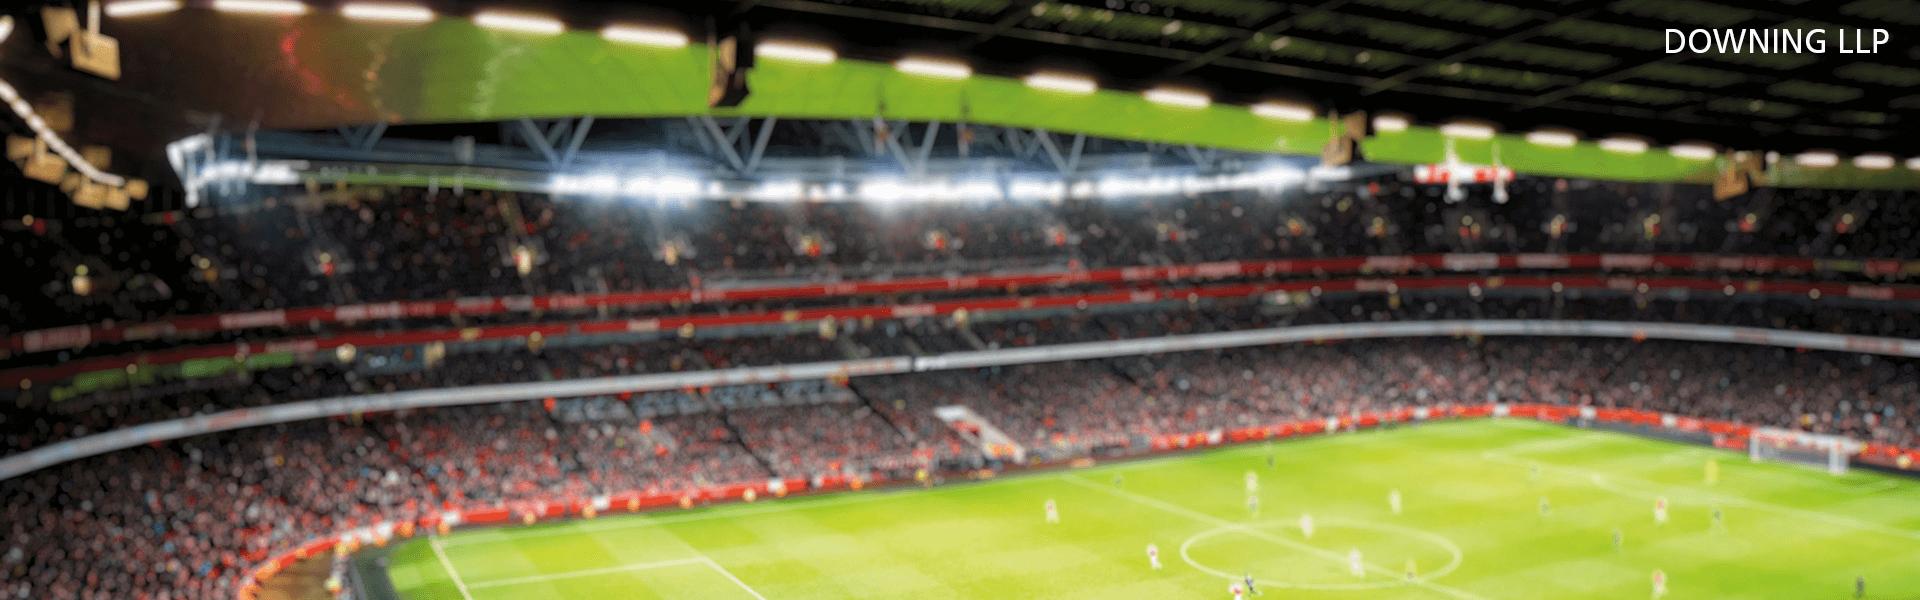 A photo of the Emirates Stadium